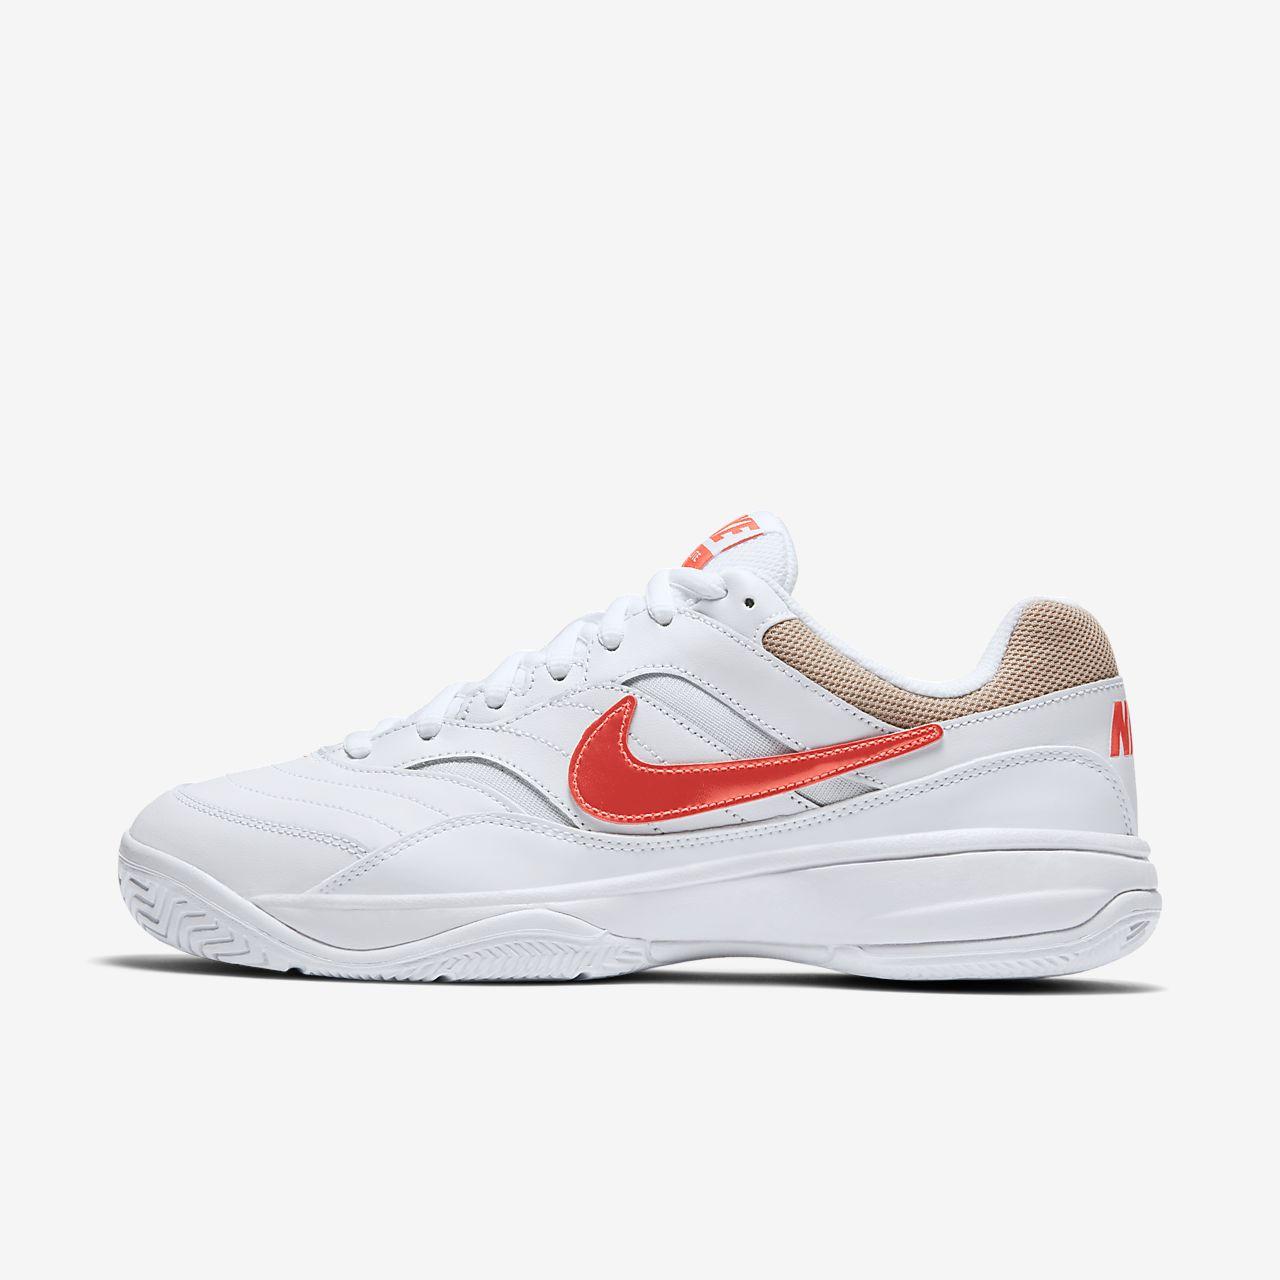 Cancha Nikecourt Para Calzado Tenis Hombre De Nike Lite Rápida YwUUEfq